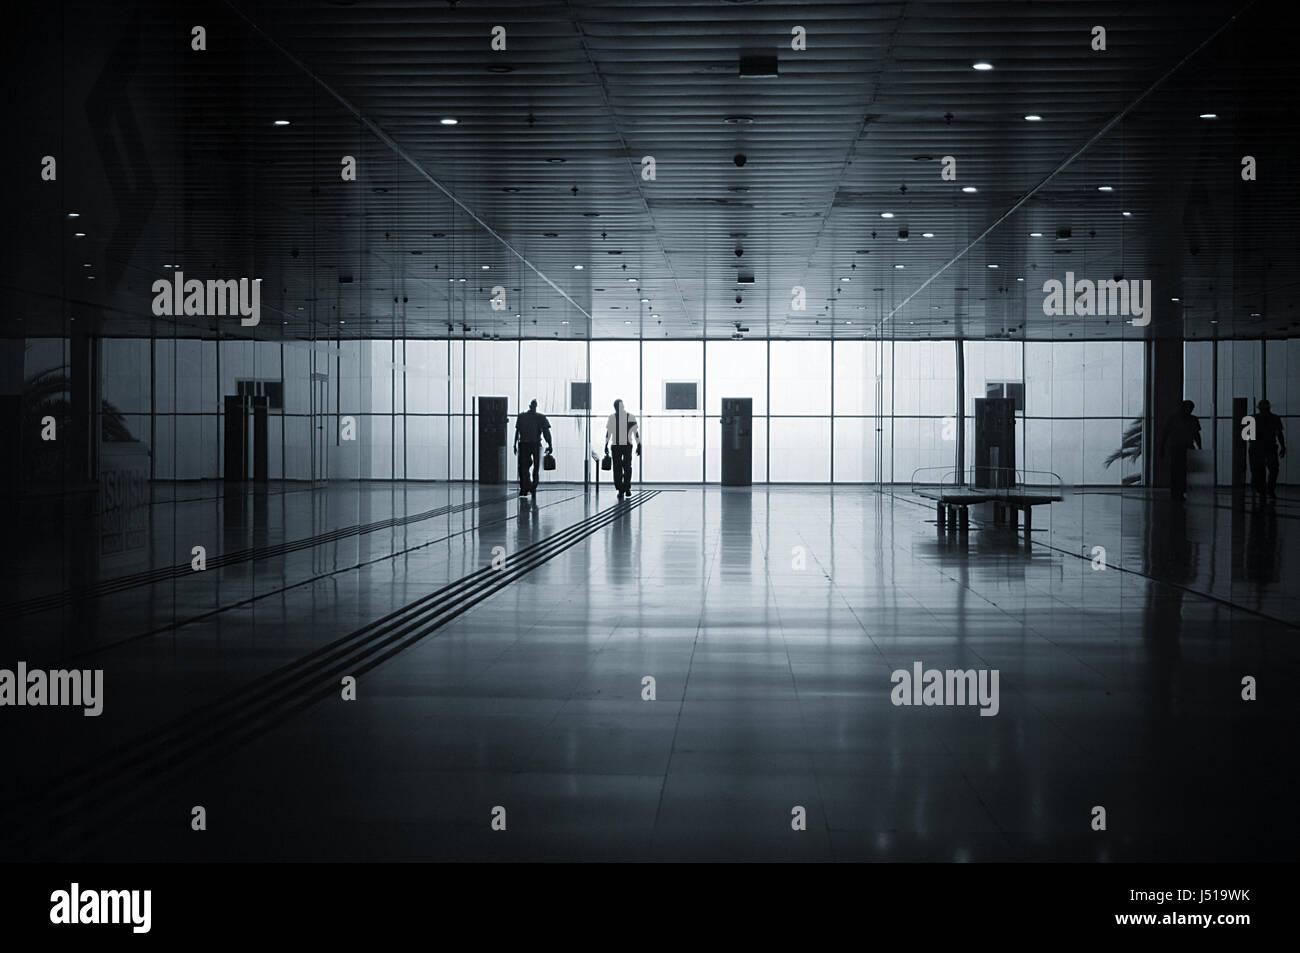 Flughafen Ankunft Anreise Reisen Reisende Reisen Flugmeilen Solo Business Reise Reisen frequent-Flyer Flyer auf Stockbild